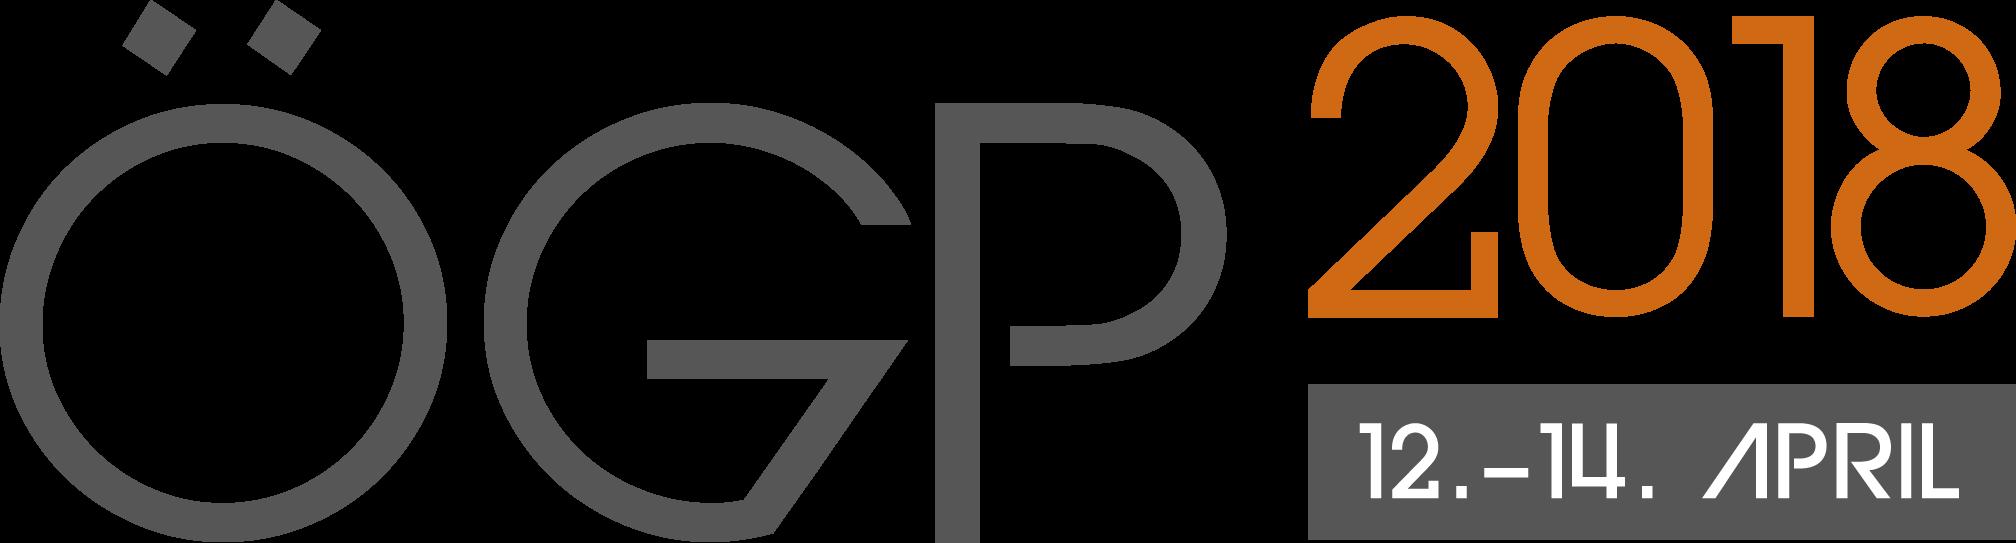 ÖGP 2018 Tagungslogo